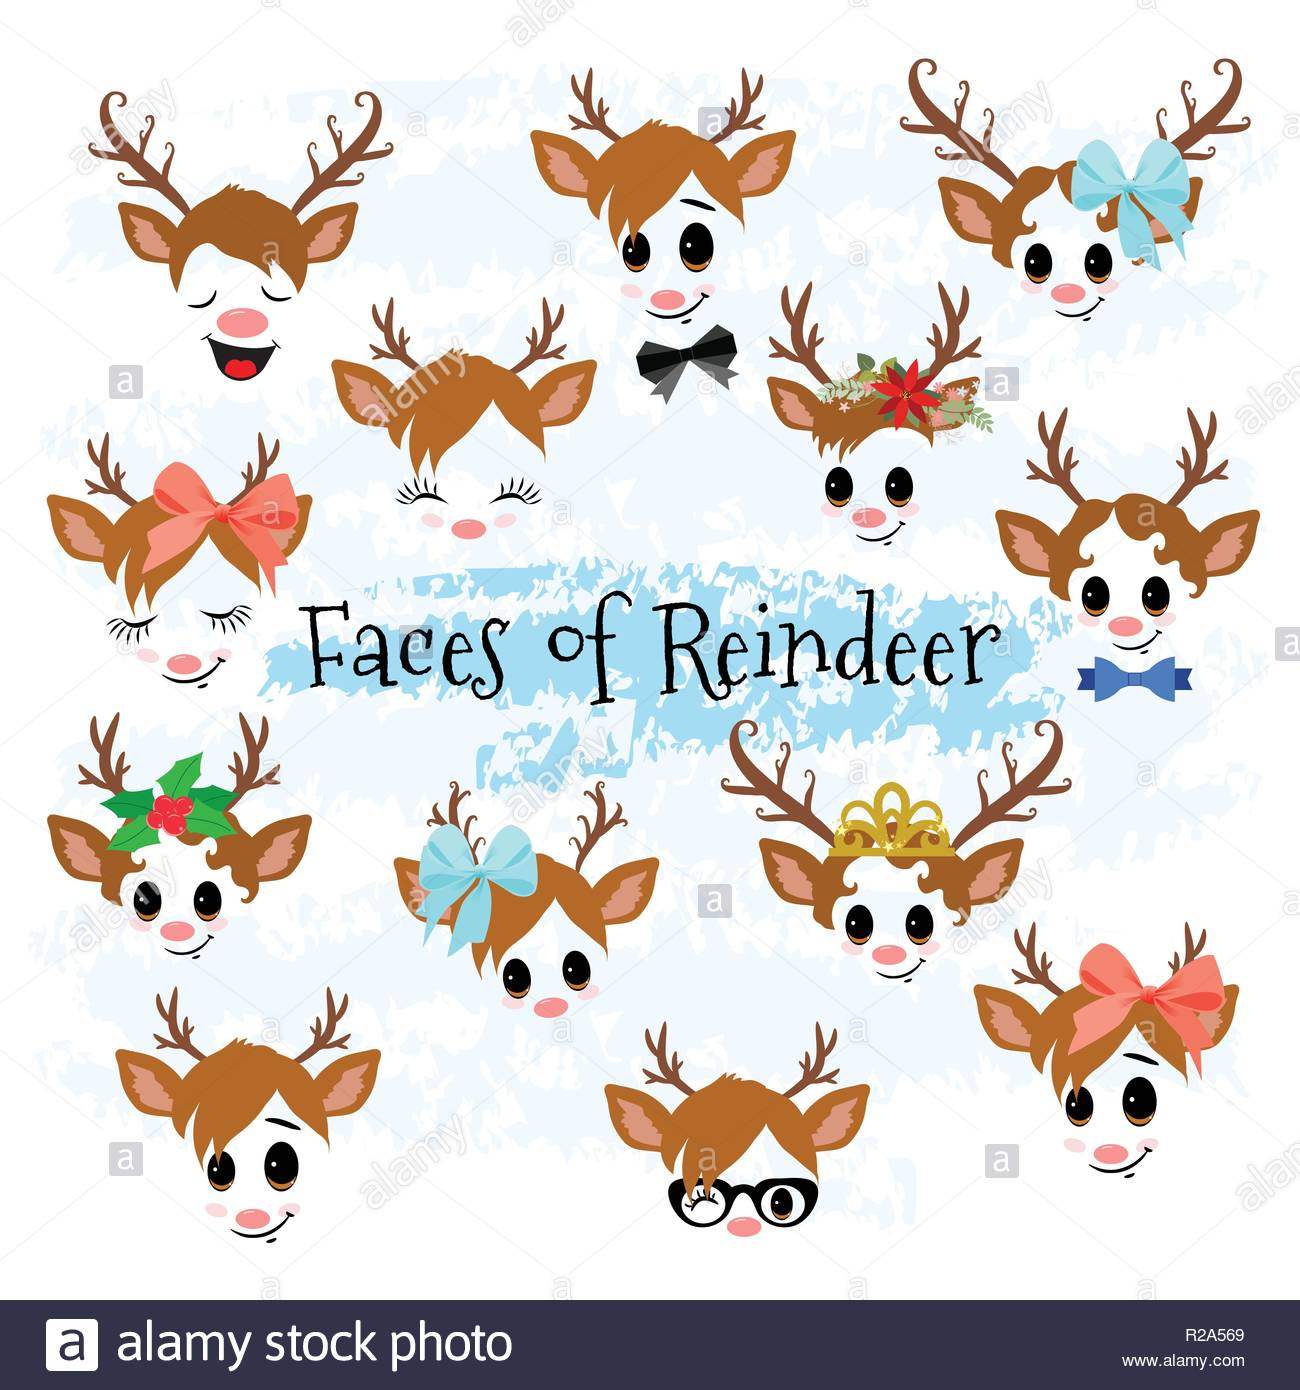 Illustration Christmas Happy Faces Stock Photos & Illustration.